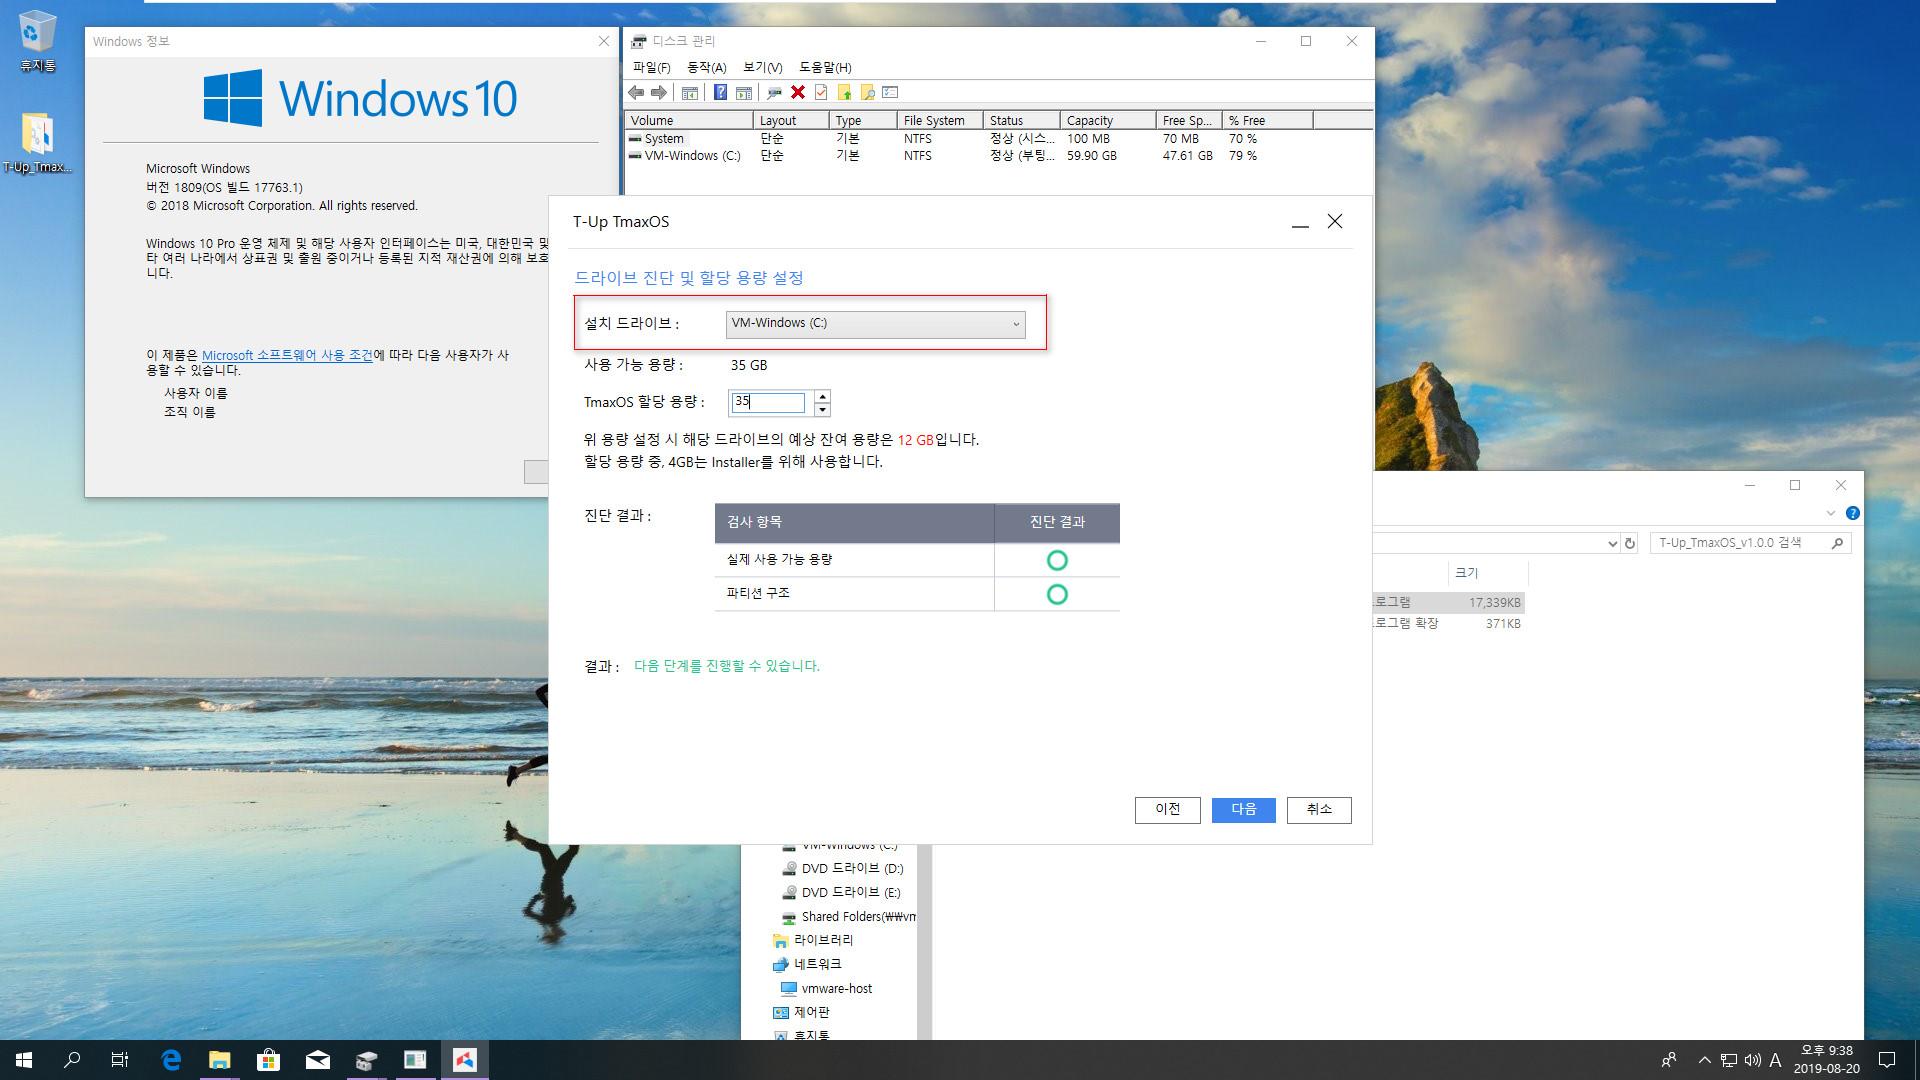 TmaxOS 설치 테스트 - 2번째 시도 - 이번에는 윈도에서 Tmax에서 제공한 T-Up TmaxOS.exe 으로 멀티 부팅으로 설치하기 2019-08-20_213802.jpg